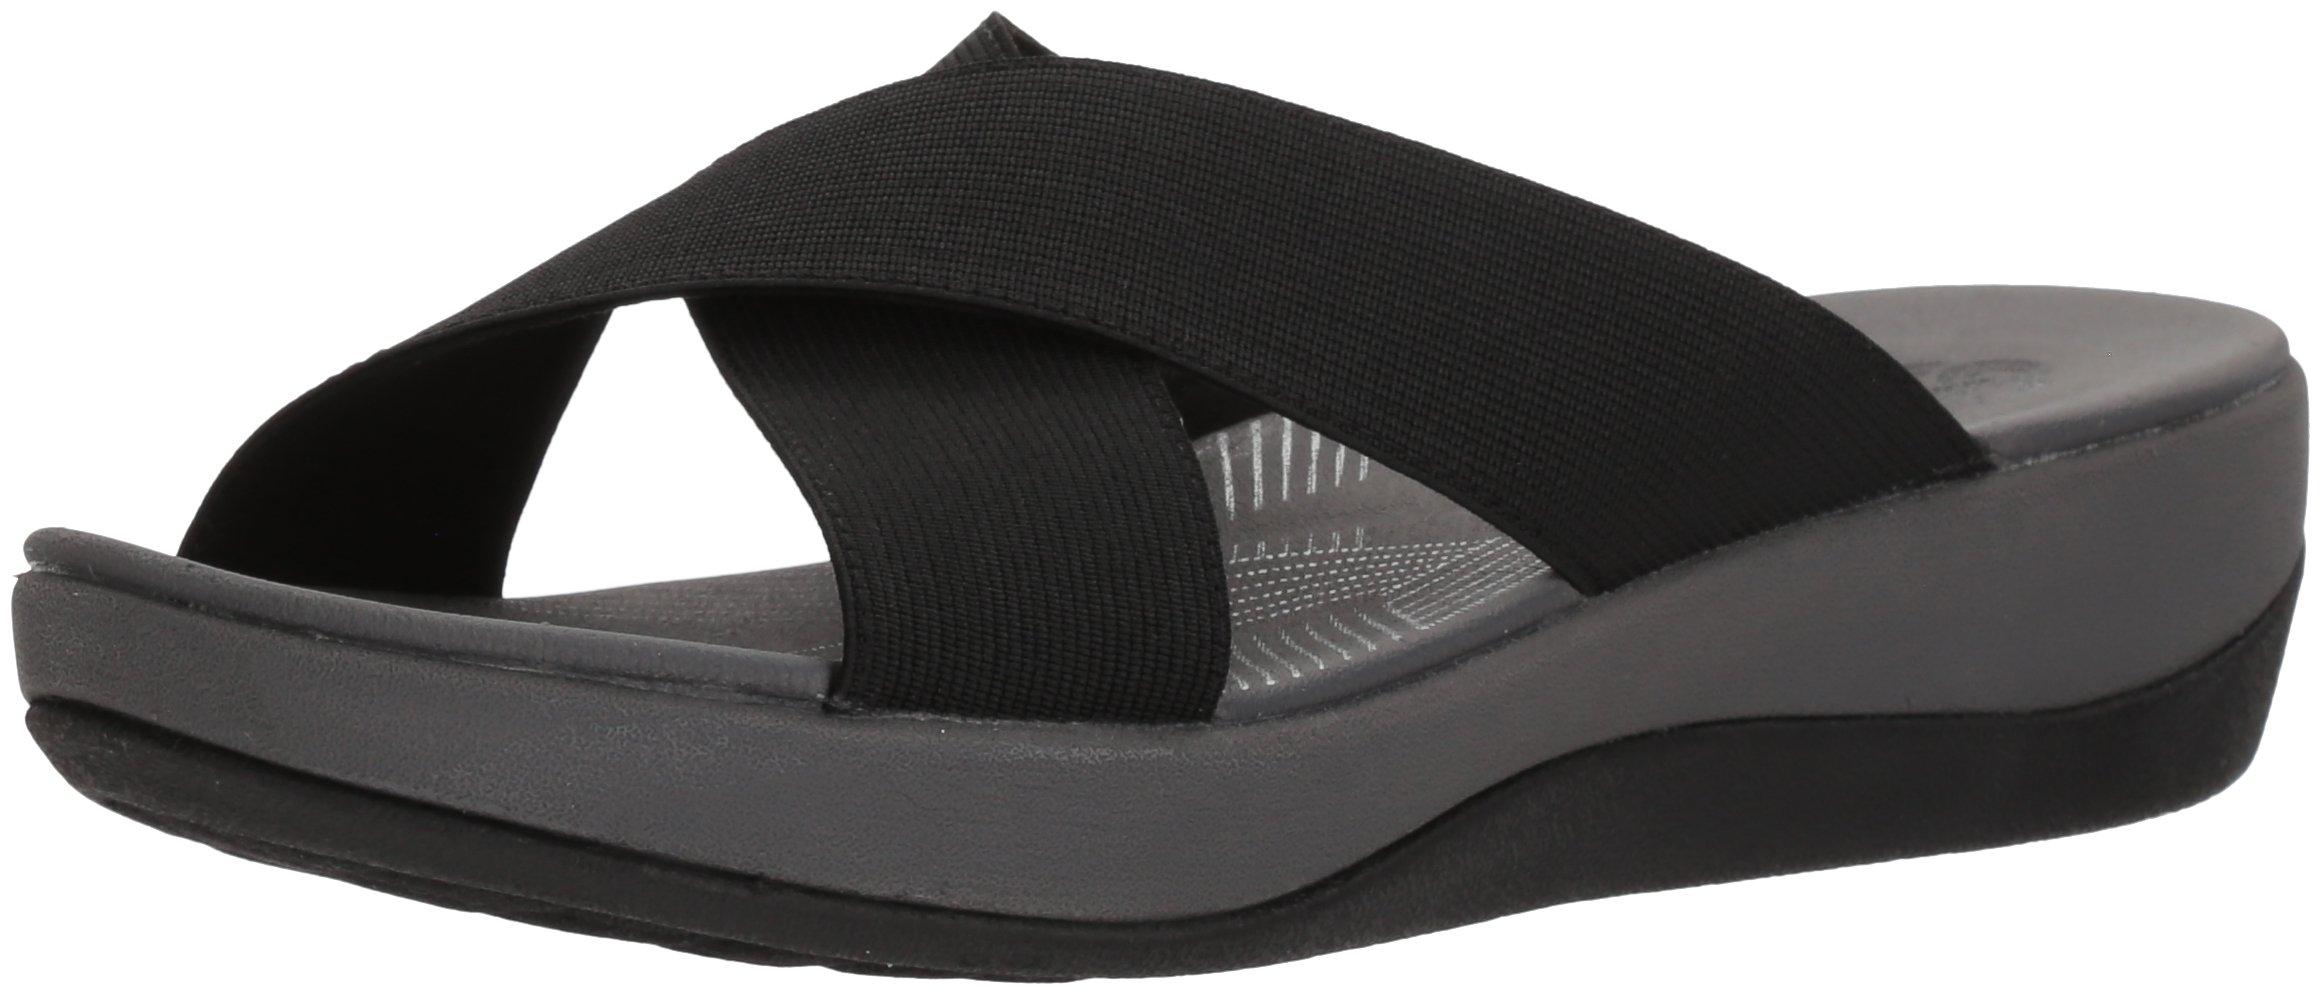 CLARKS Women's Arla Elin Sandal, Black Solid Textile, 8 Medium US by CLARKS